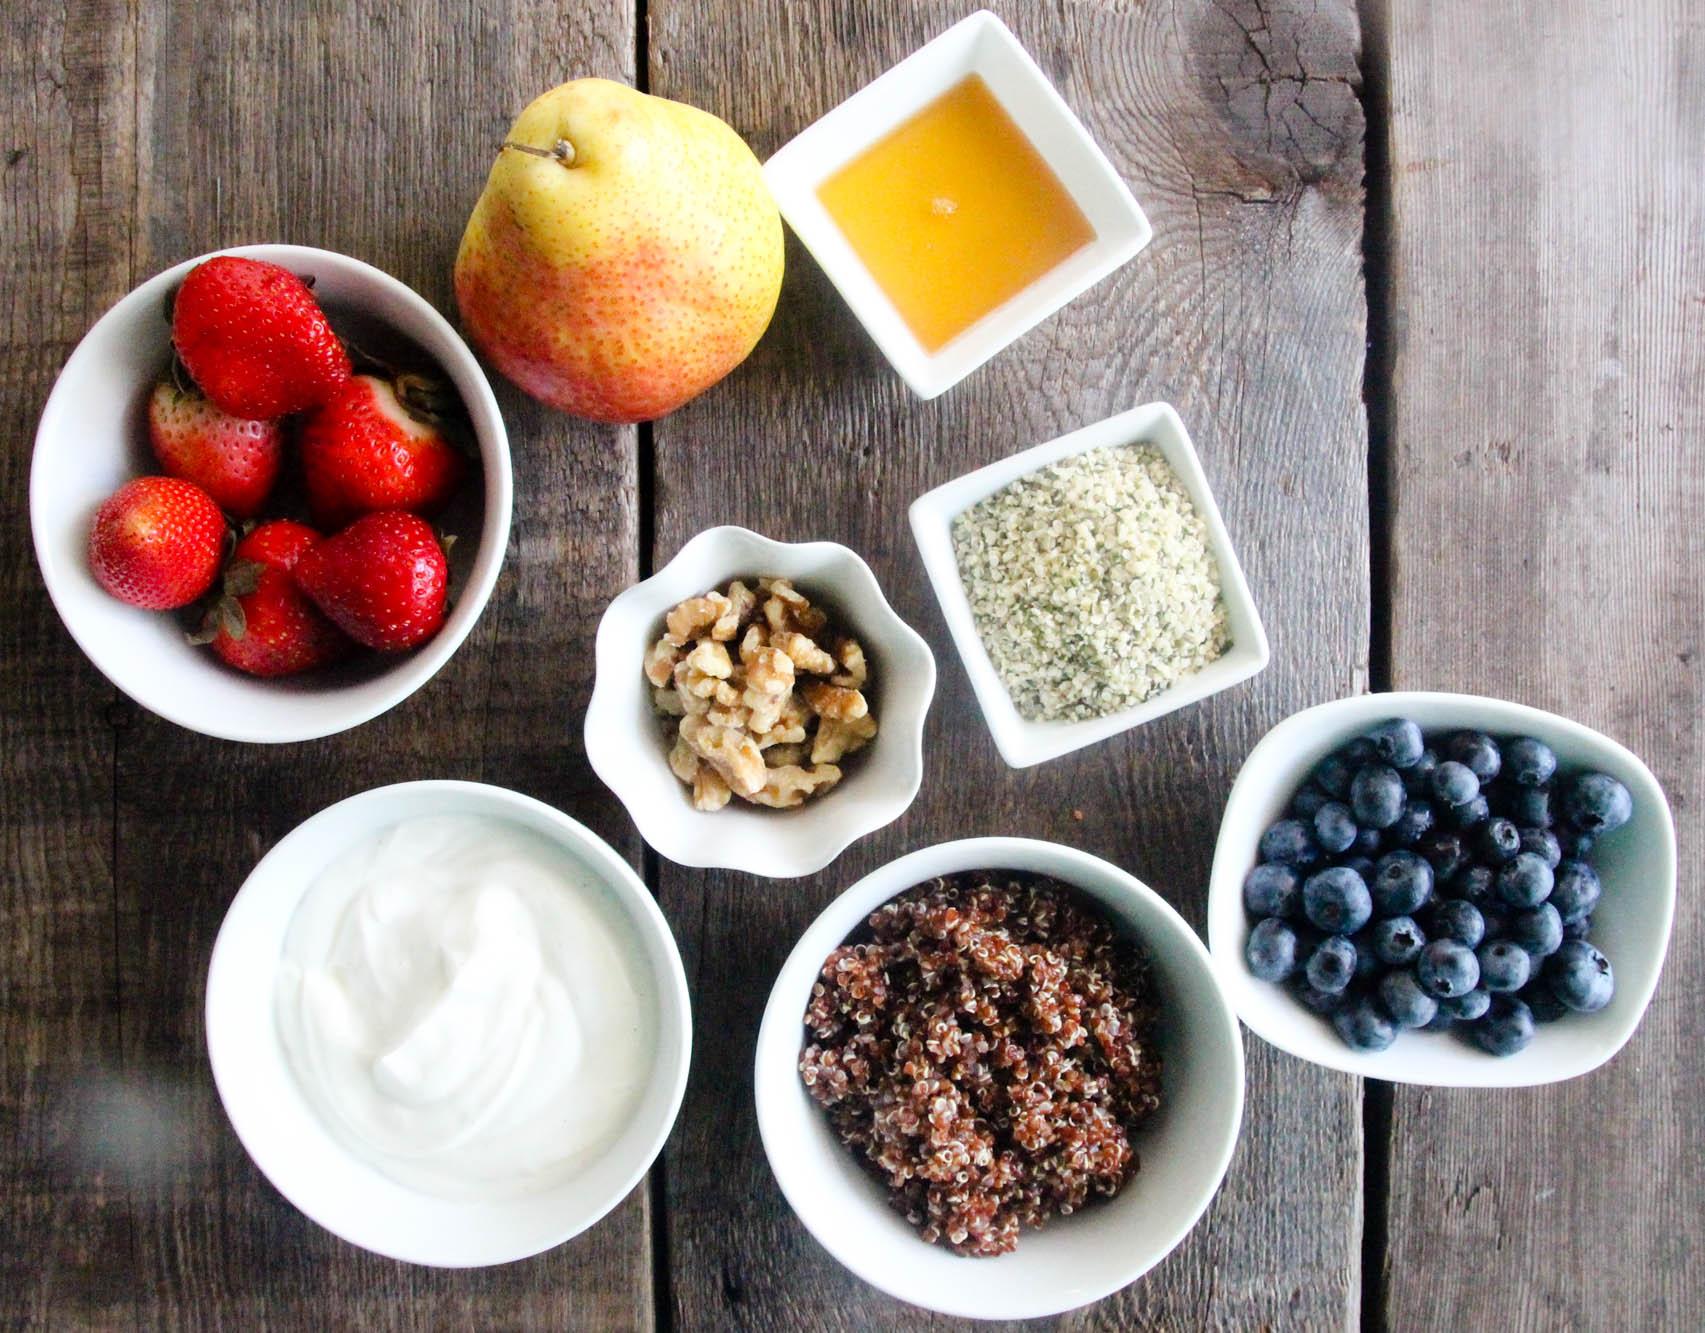 red-quinoa-hemp-hearts-fruit-smoothie-bowl-2